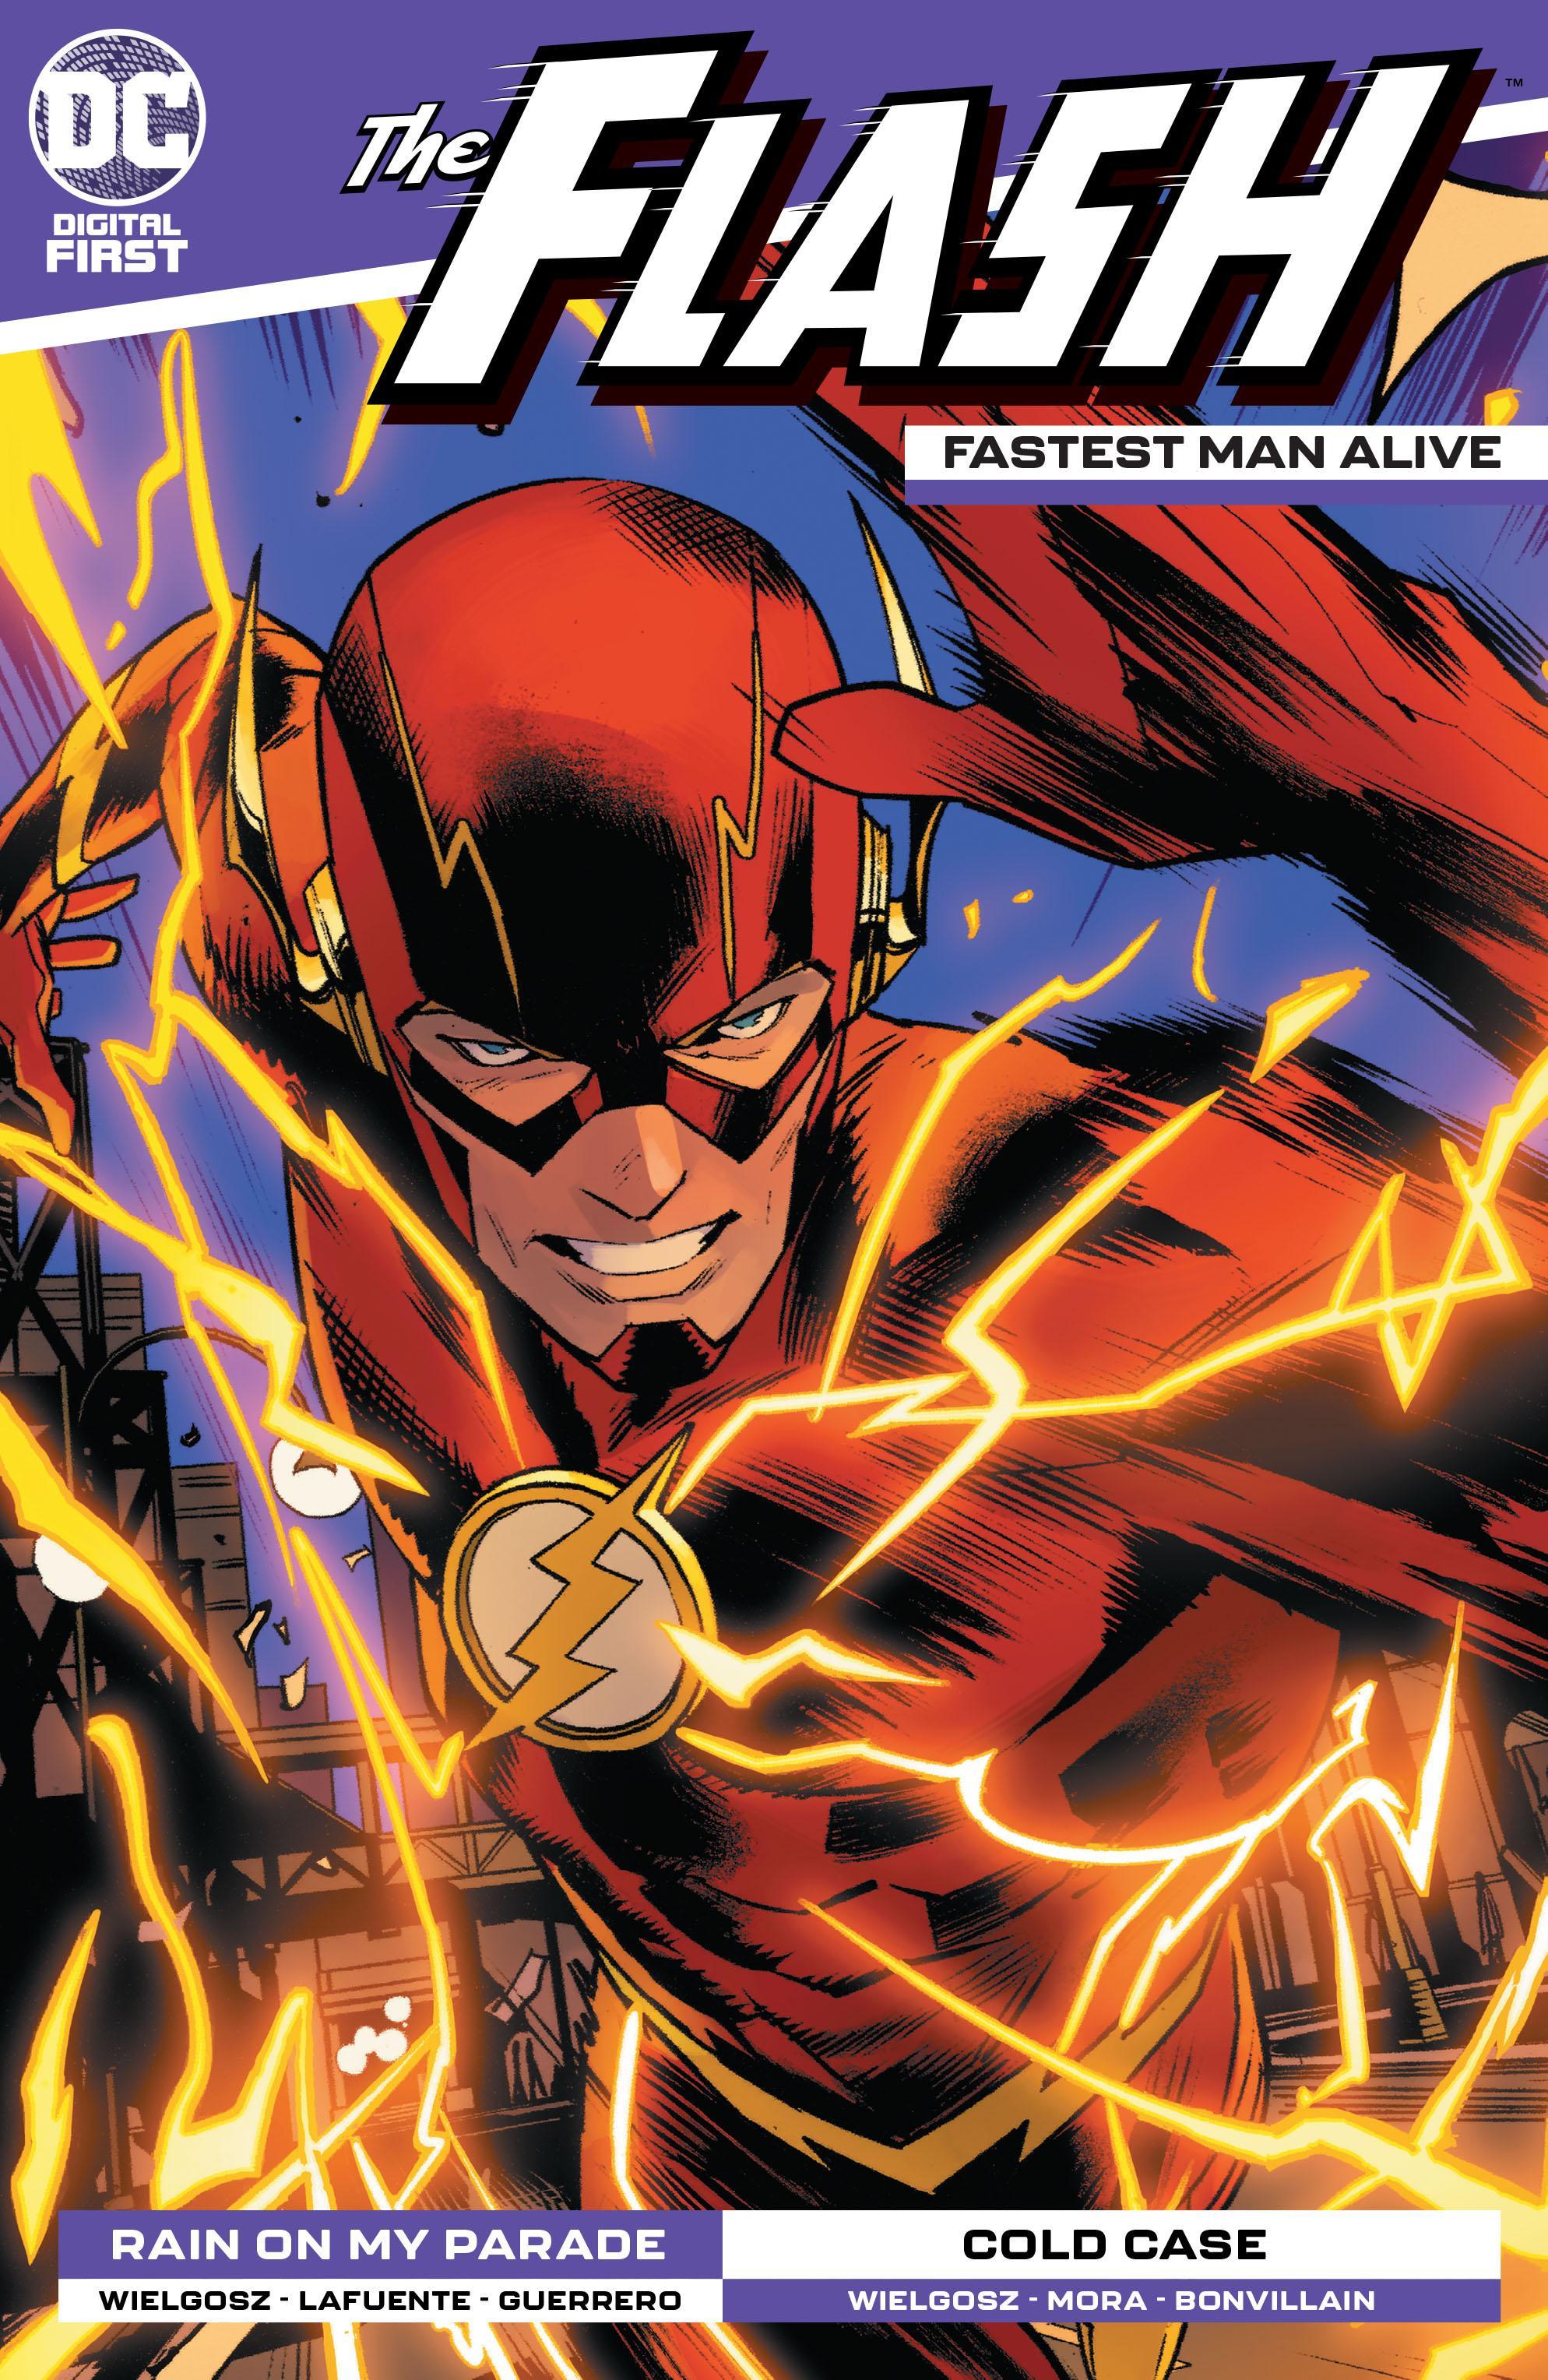 Friday? File 1 of 1 yEnc The Flash Fastest Man Alive 008 (2020) (Digital) (Zone Empire